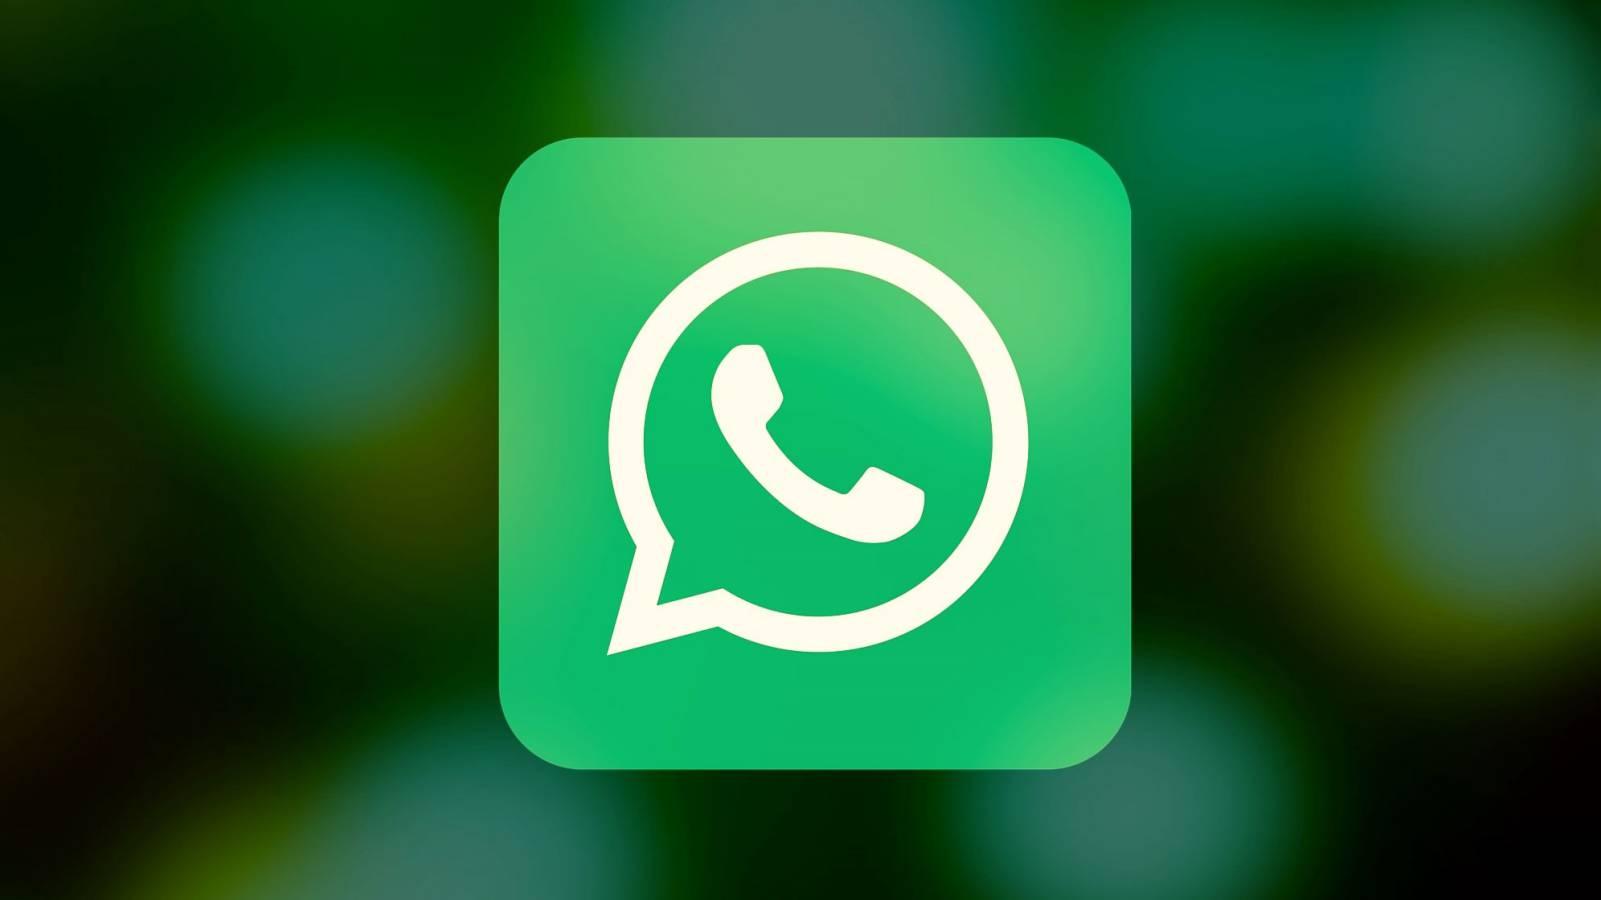 whatsapp blocat ios 8